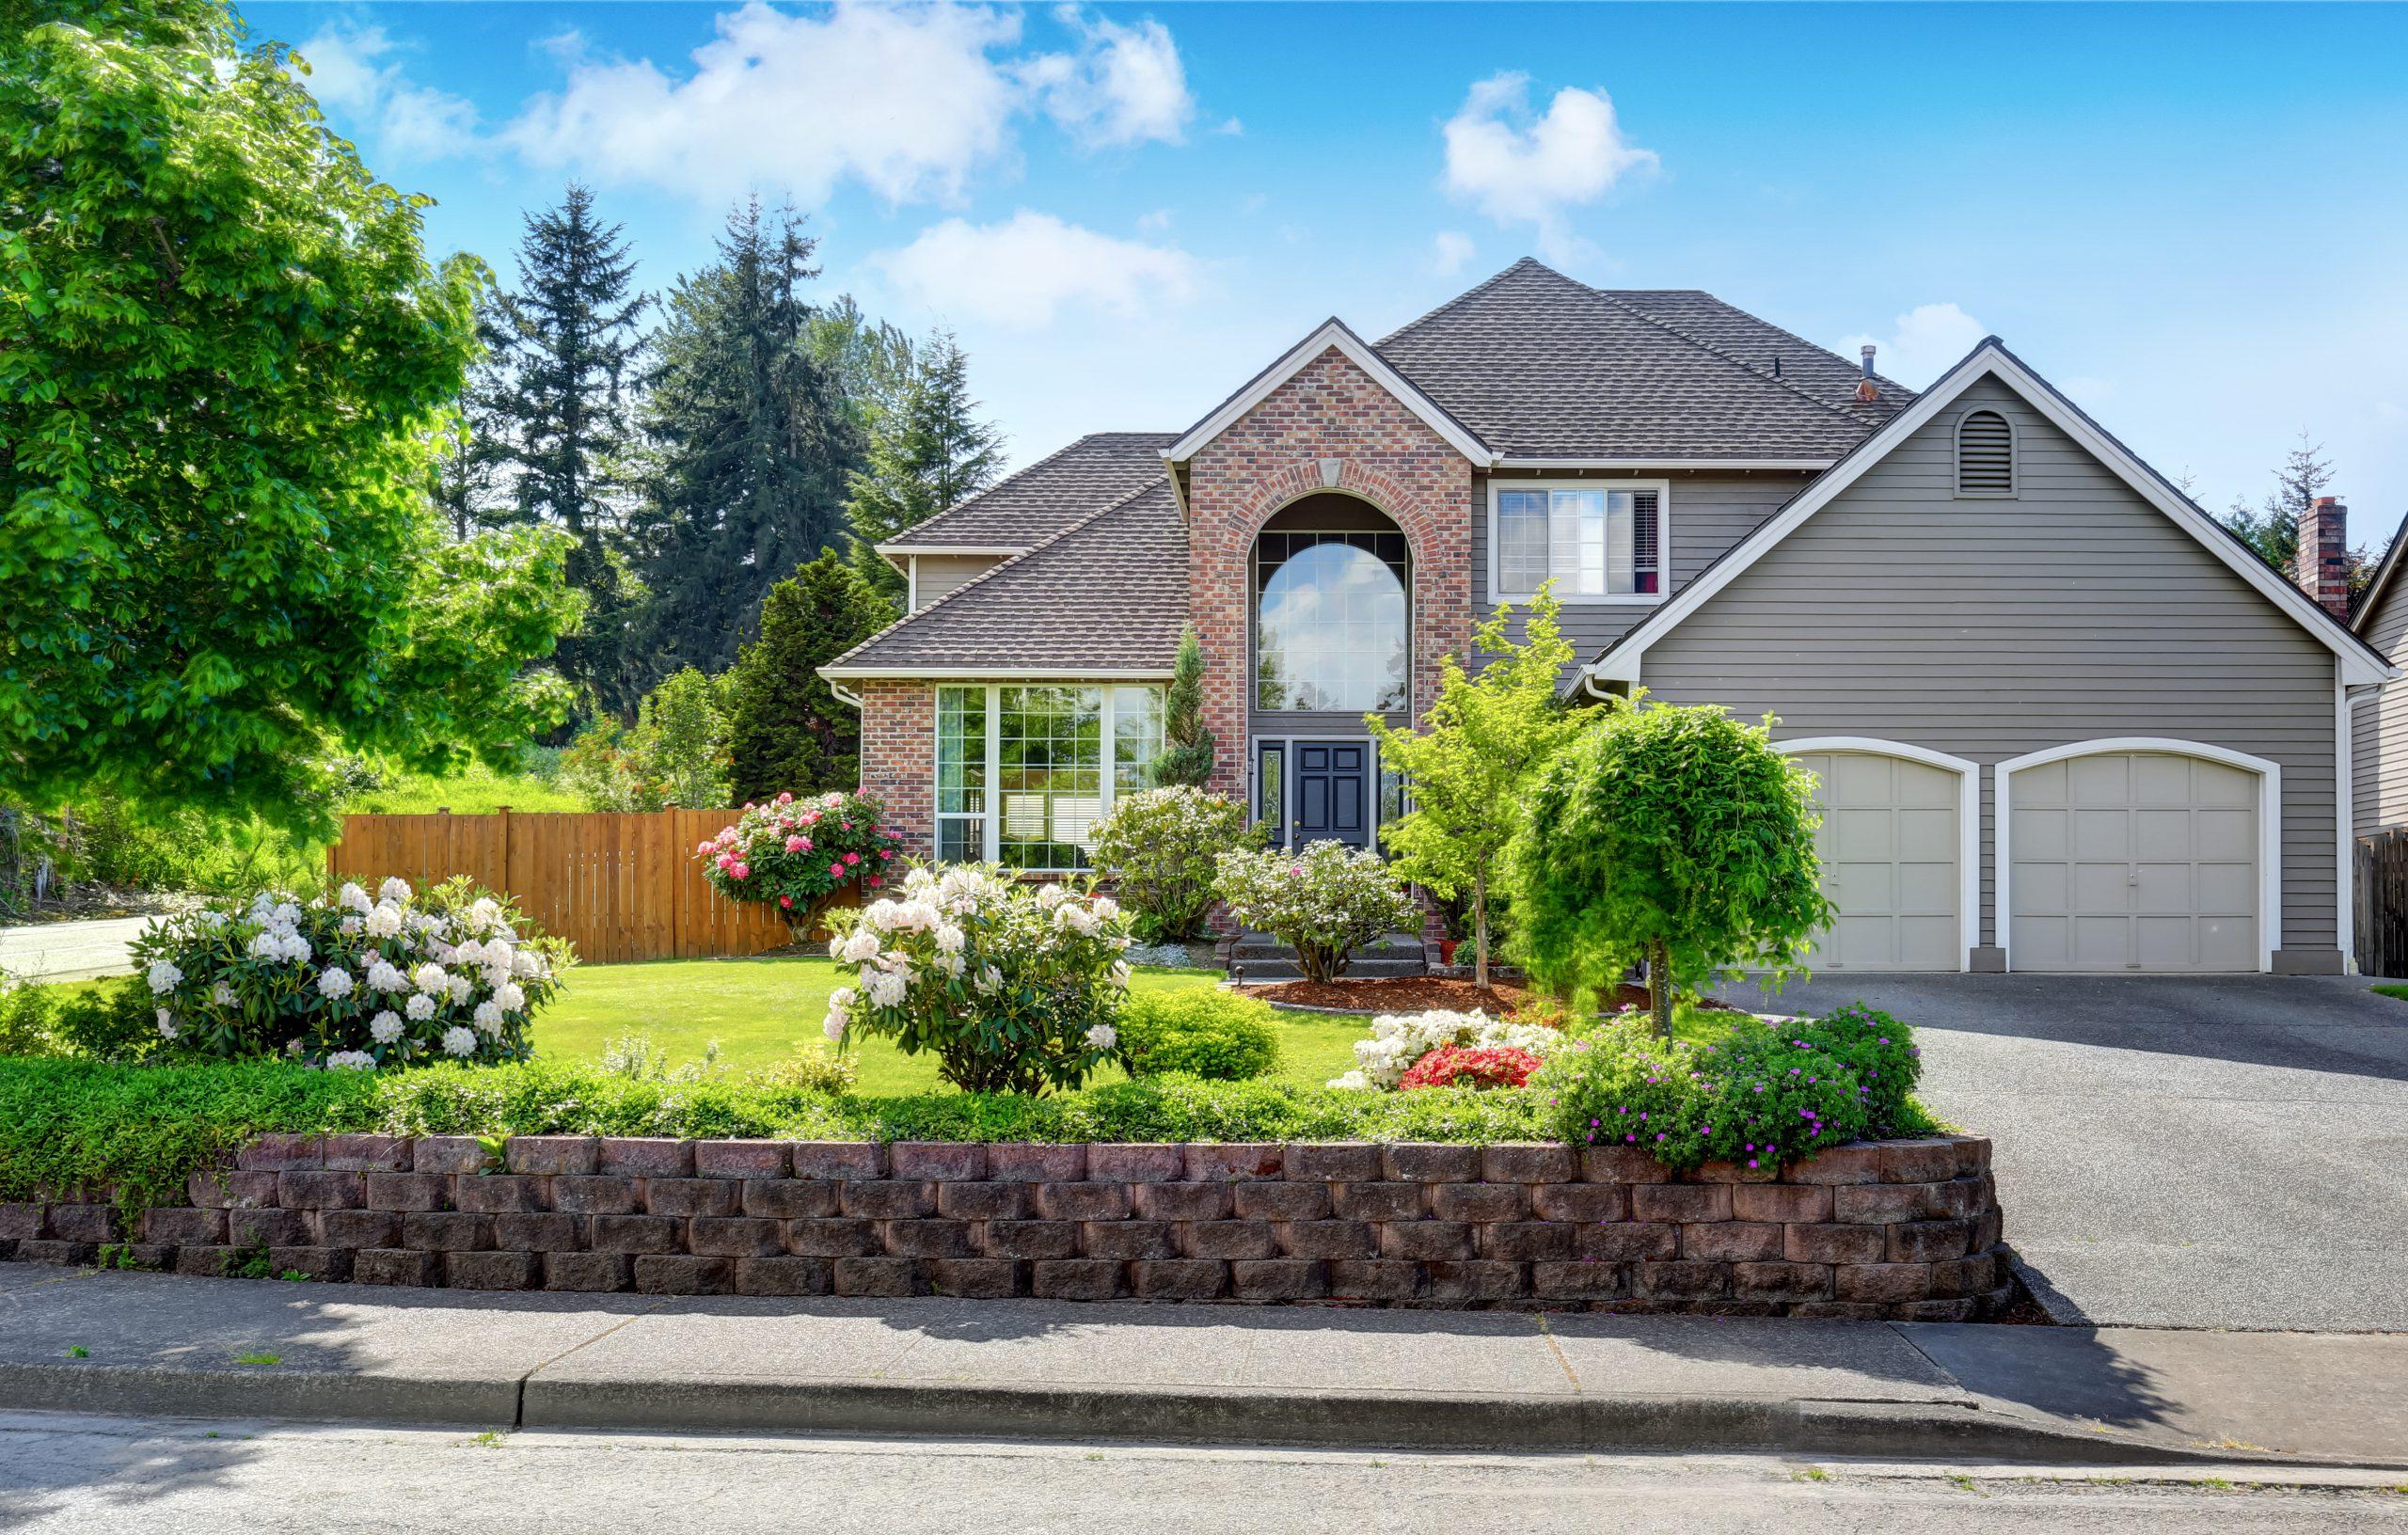 Luxury house with cedar shingles